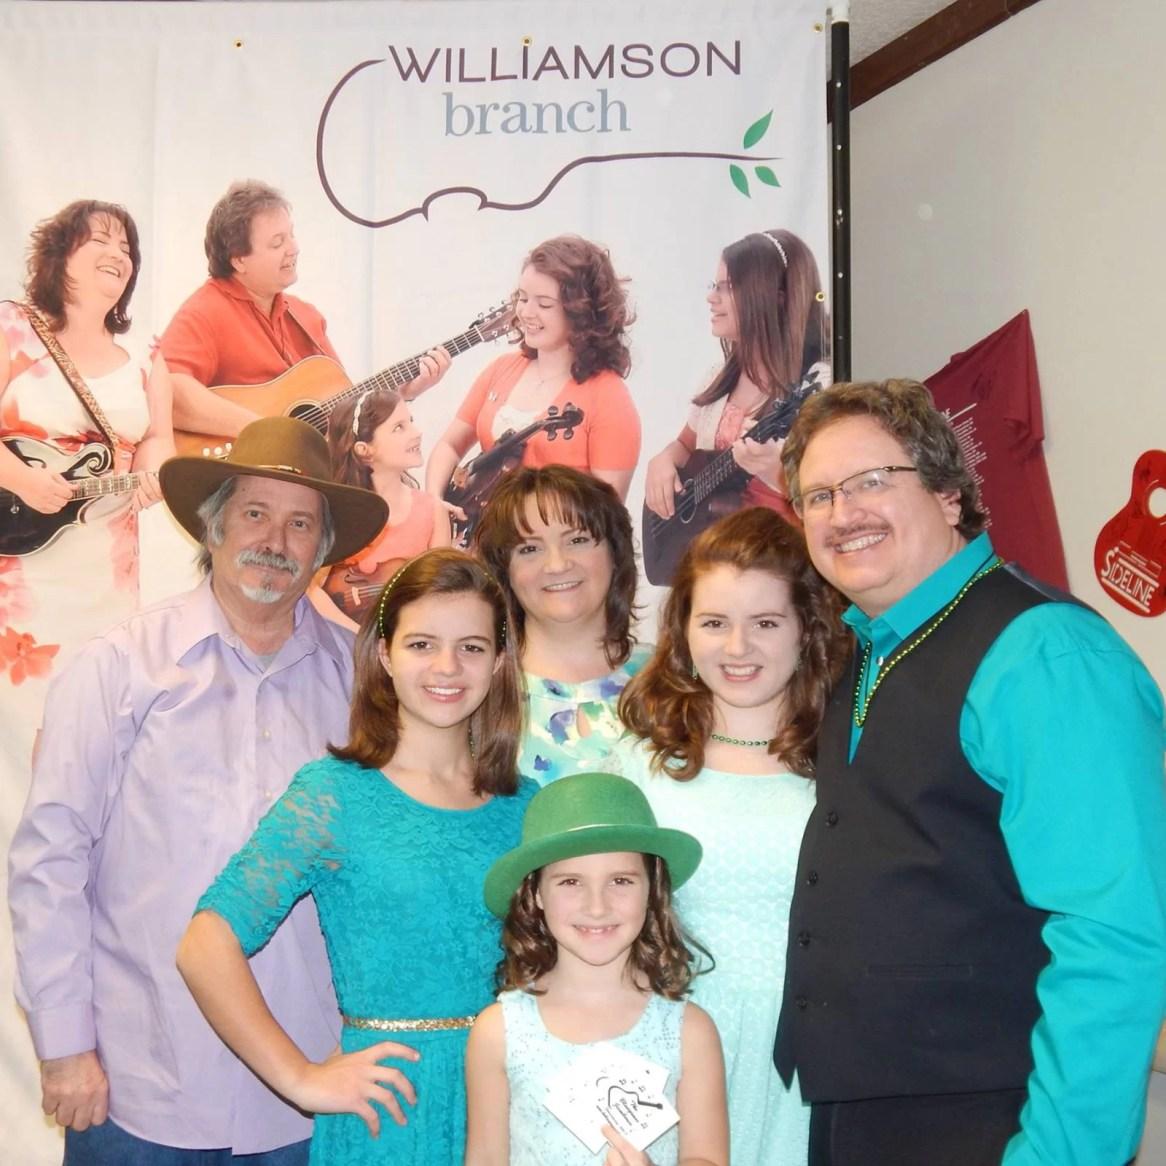 Williamson Branch